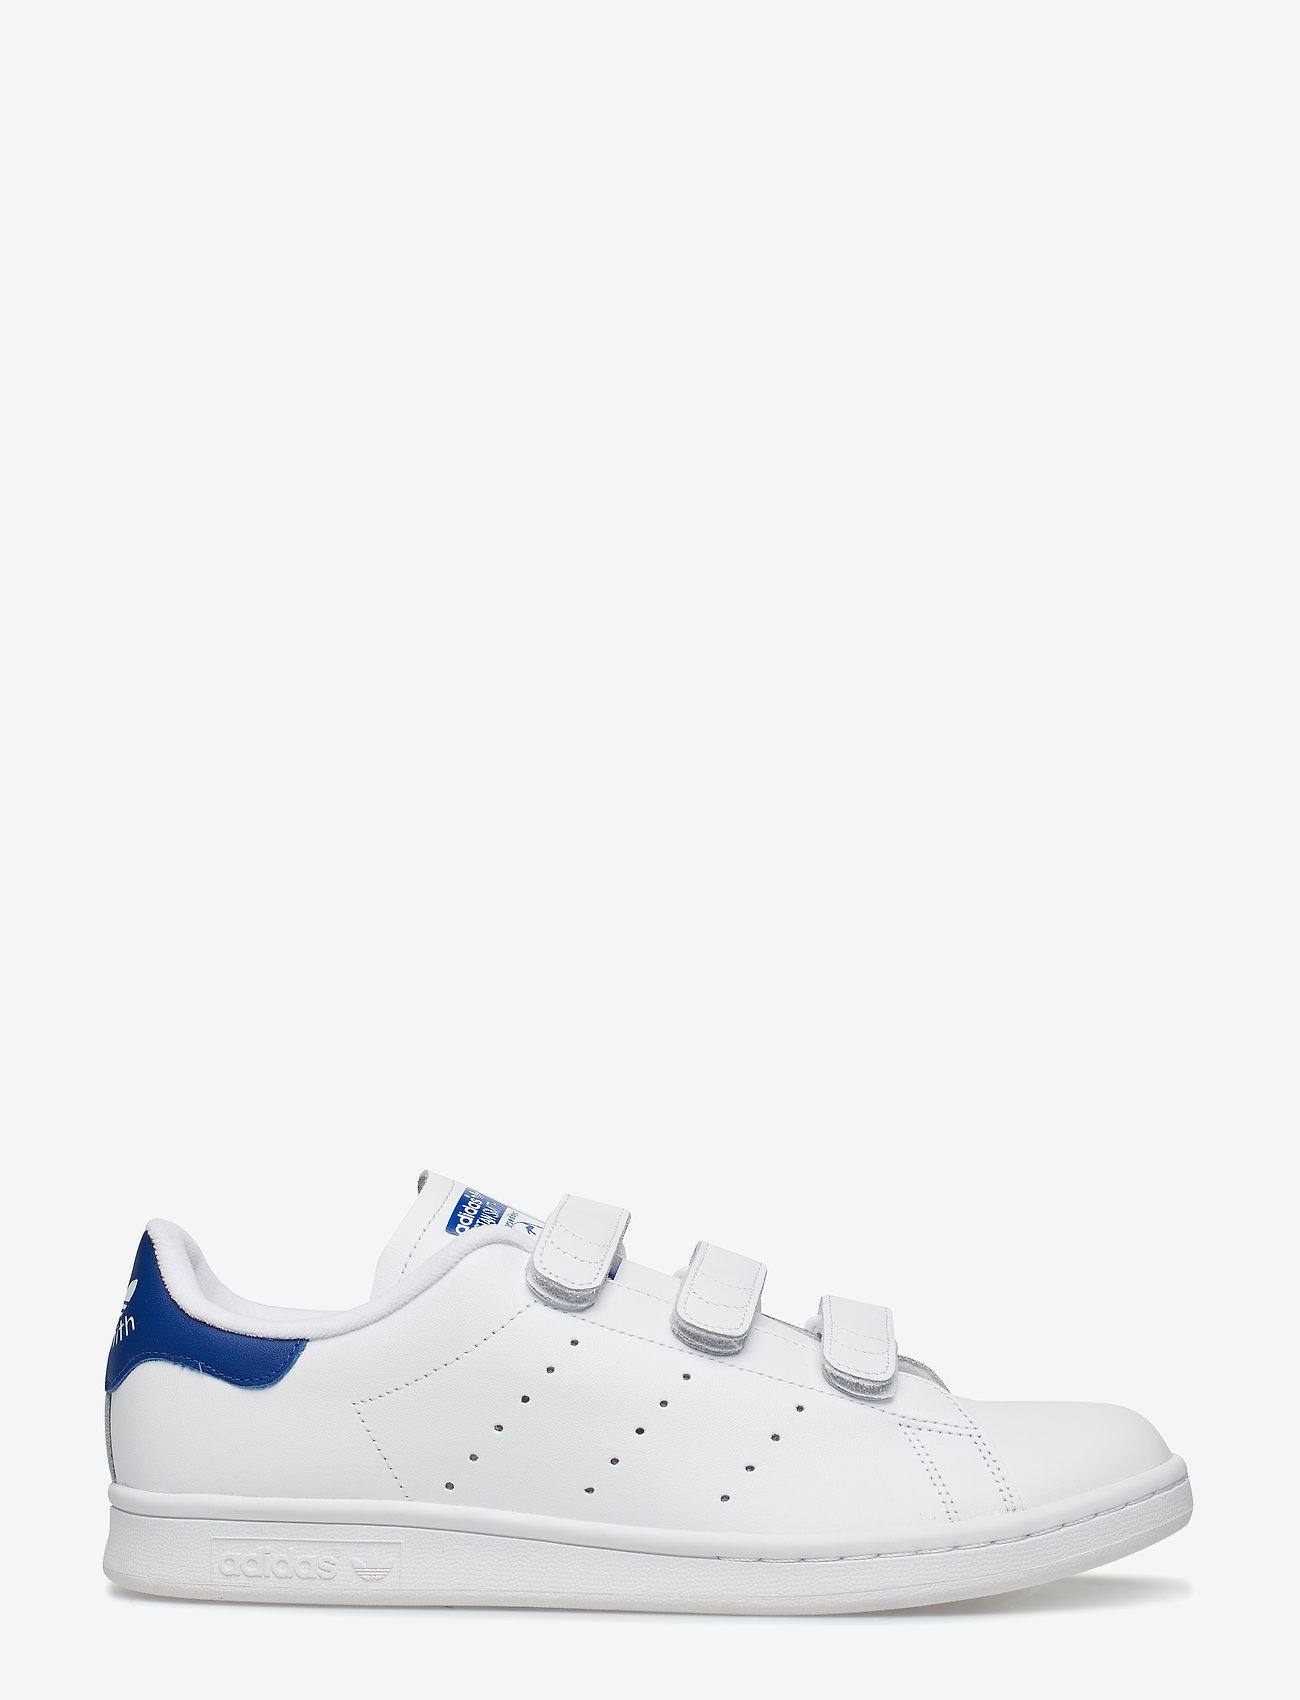 adidas Originals - STAN SMITH CF - lav ankel - ftwwht/ftwwht/croyal - 1